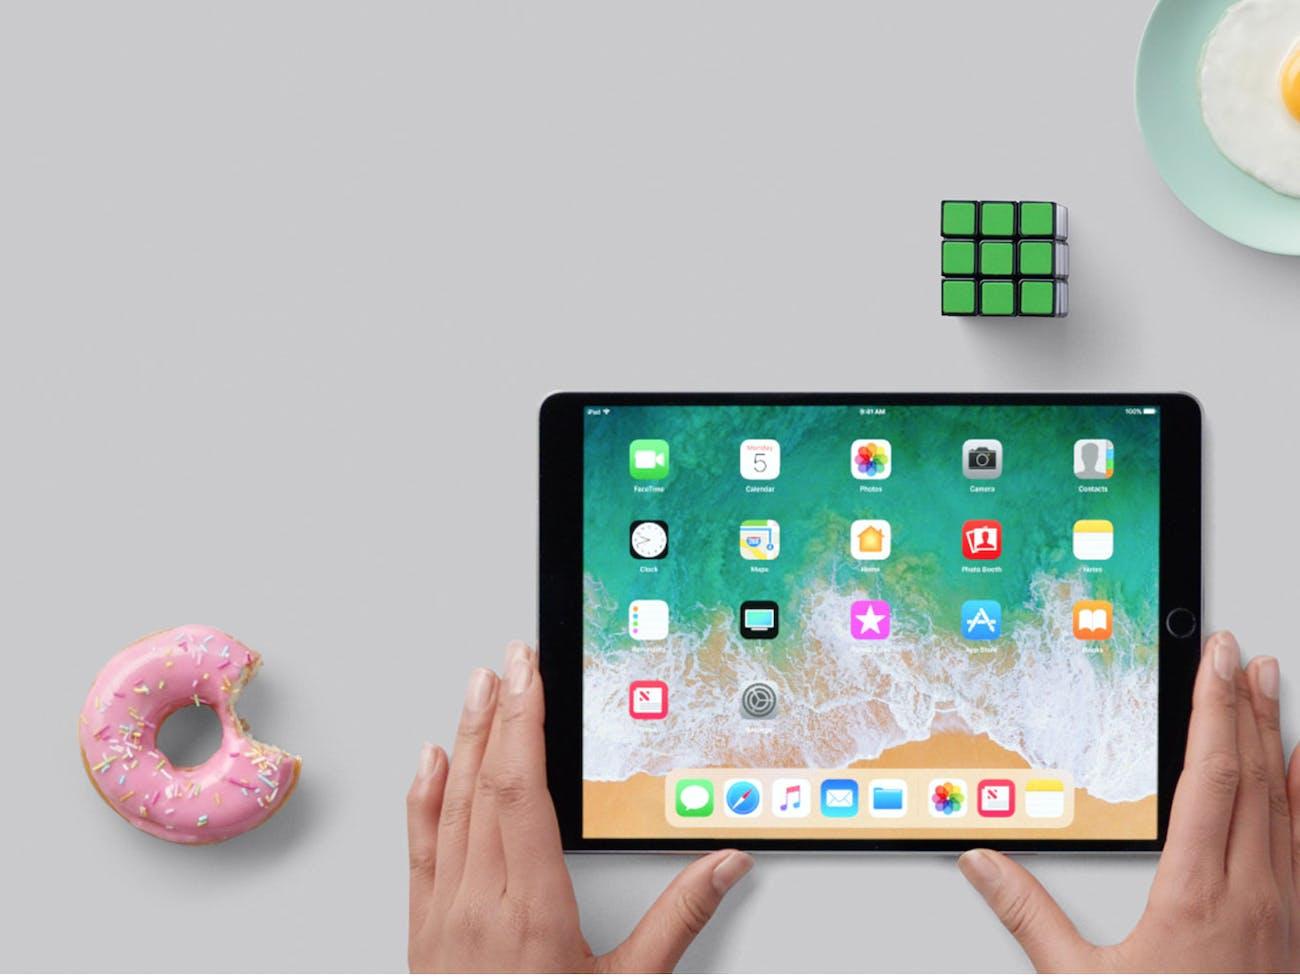 apple new ipad 2018